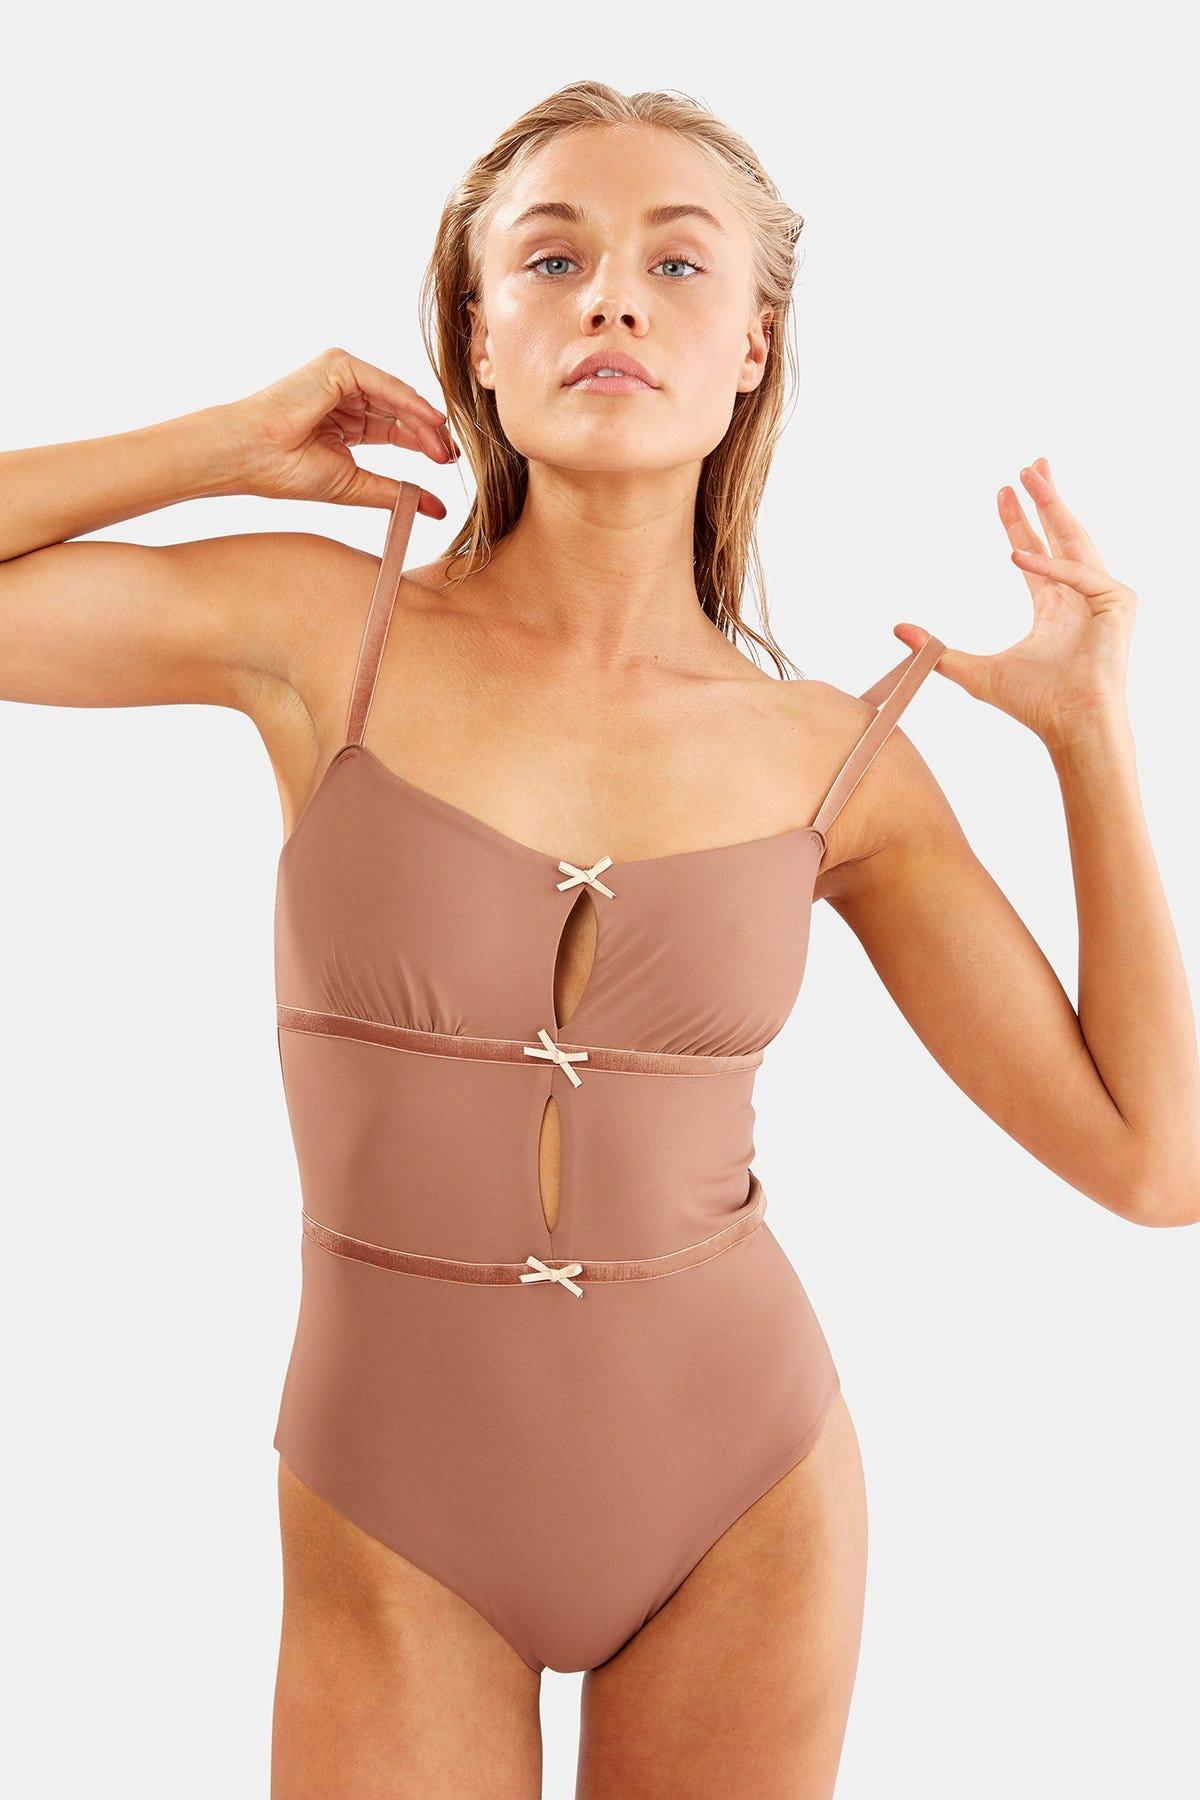 055d5dfba9 New Swimsuit Trends 2019 Cool Bikini, One-Piece Styles